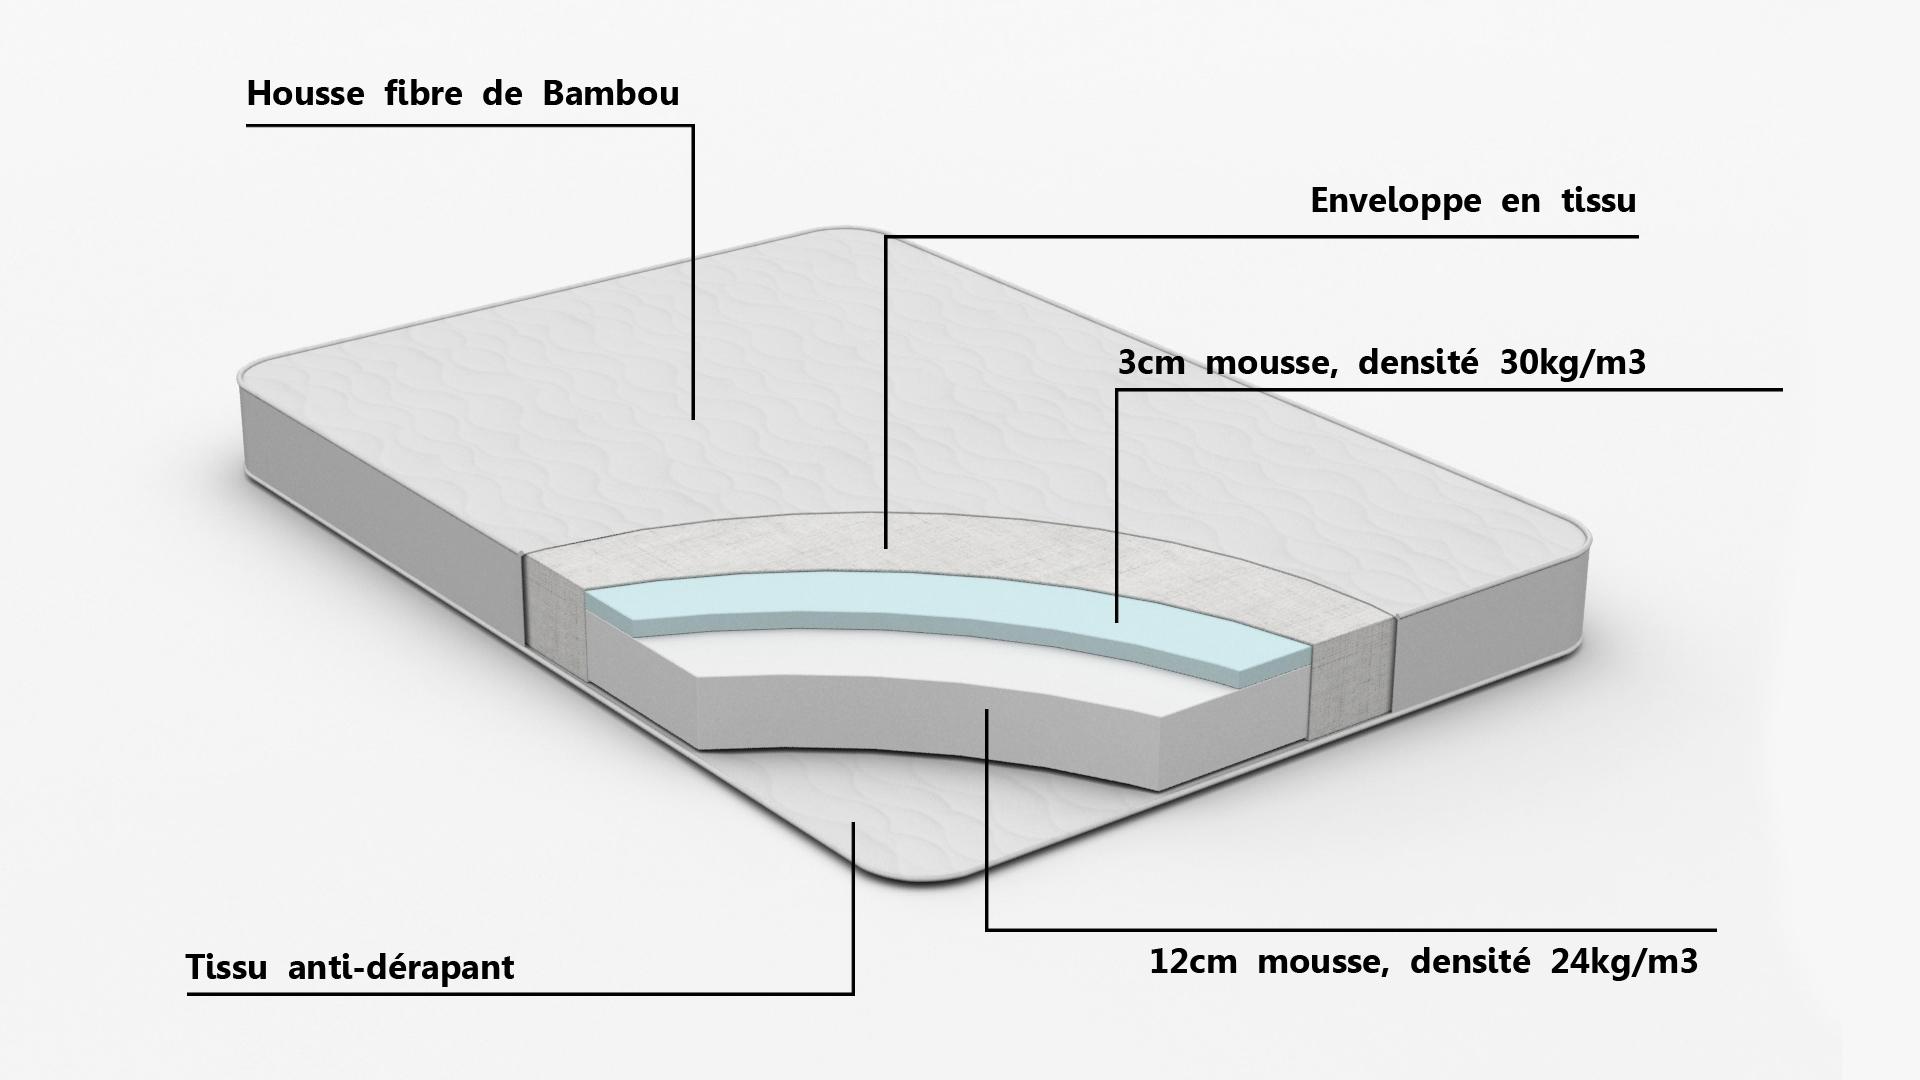 matelas mousse3cm le blog mobilier moss. Black Bedroom Furniture Sets. Home Design Ideas